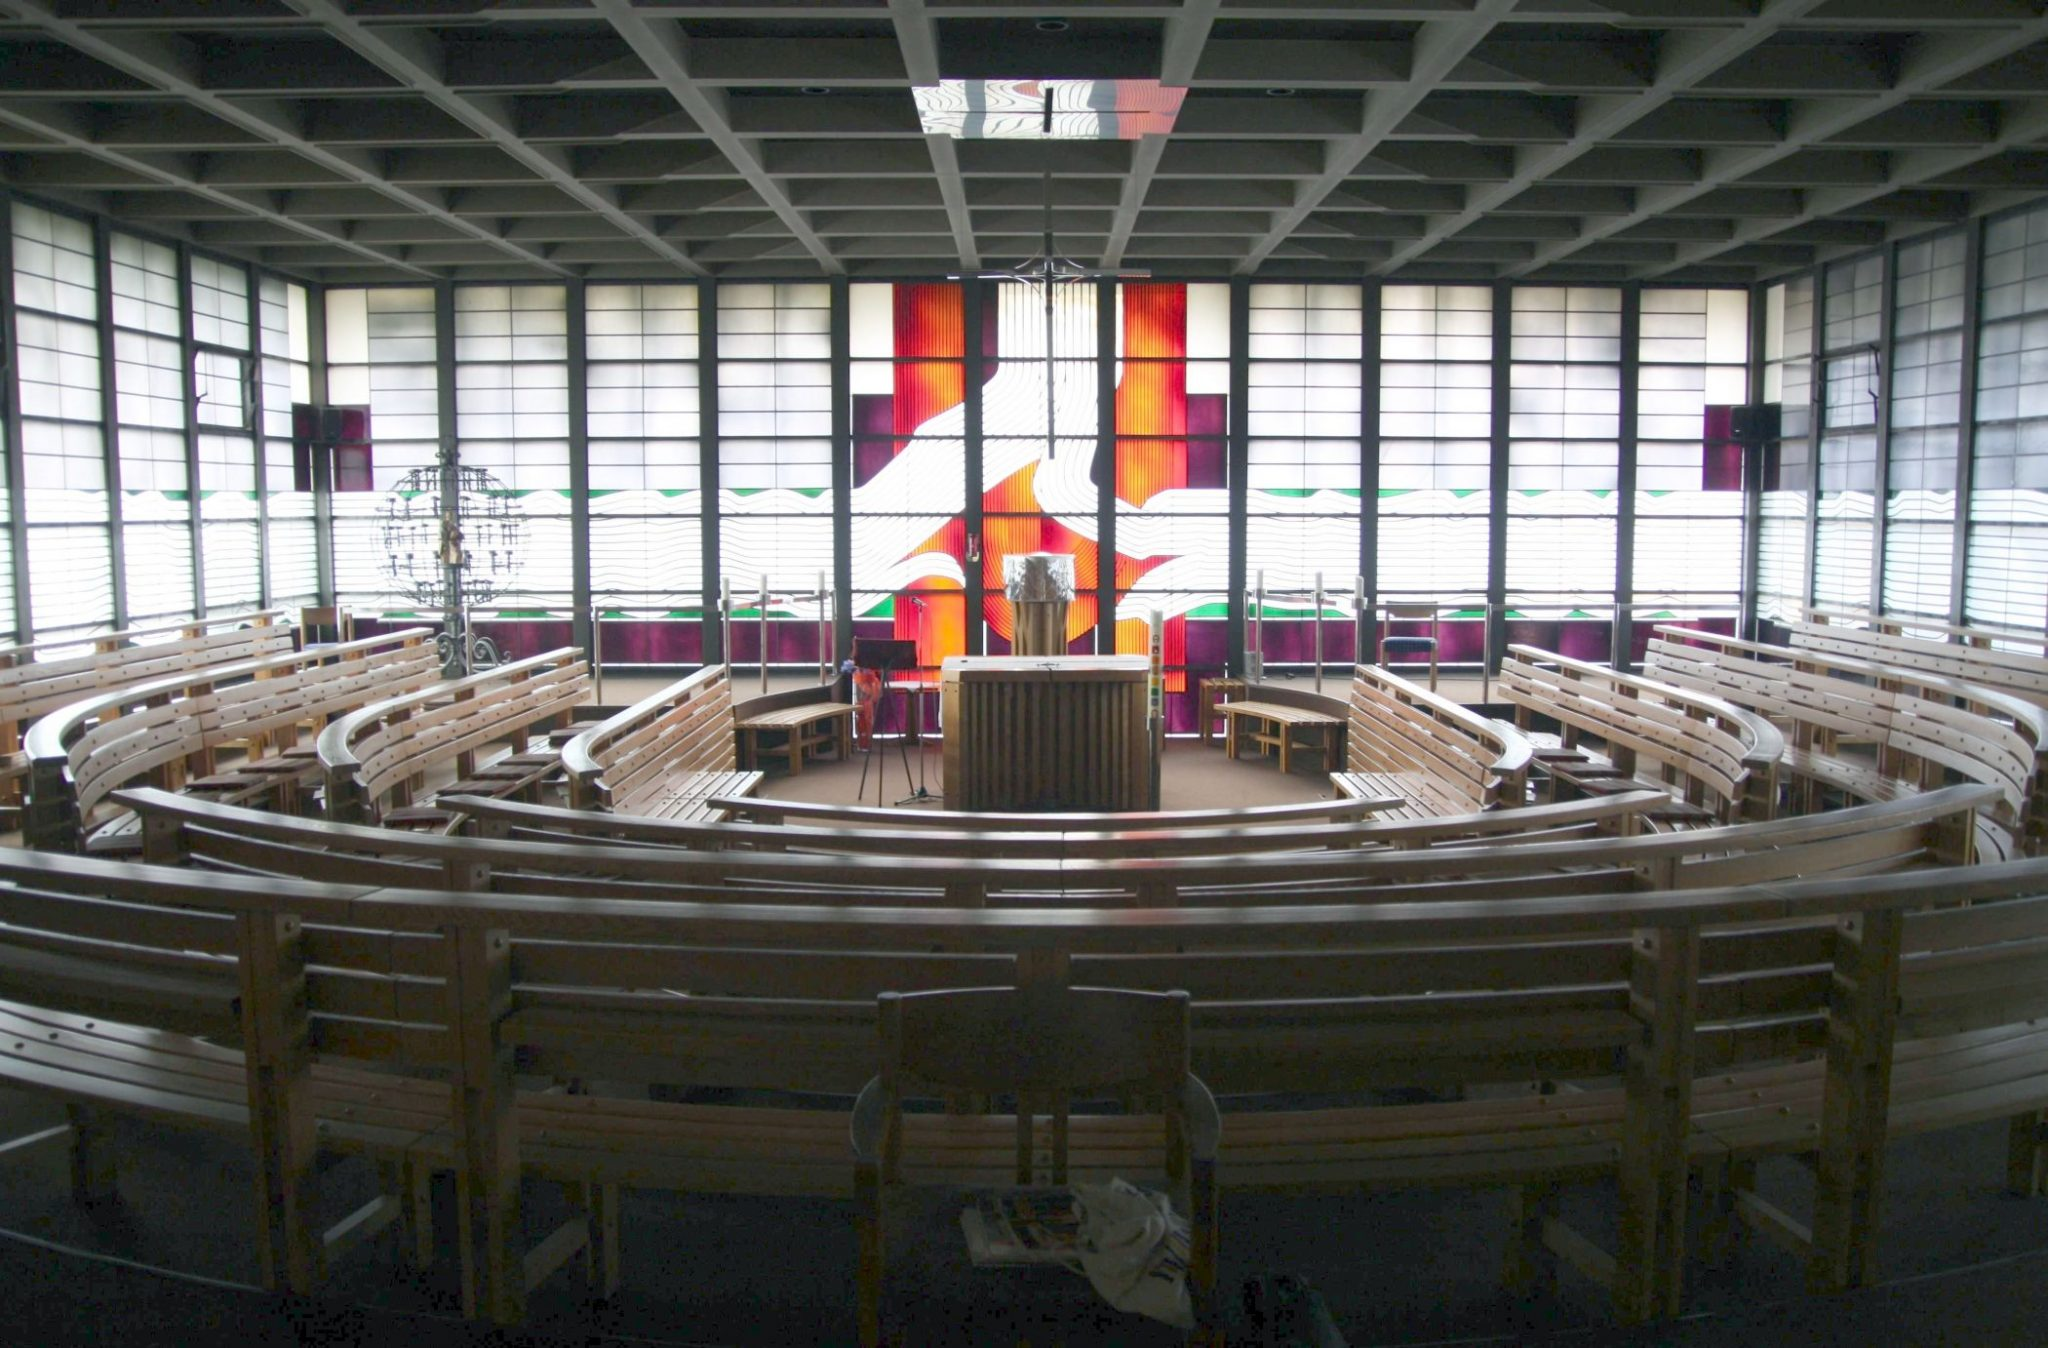 Denkmal des Monats: Kapelle St. Josef auf dem Finkenhagen in Olpe